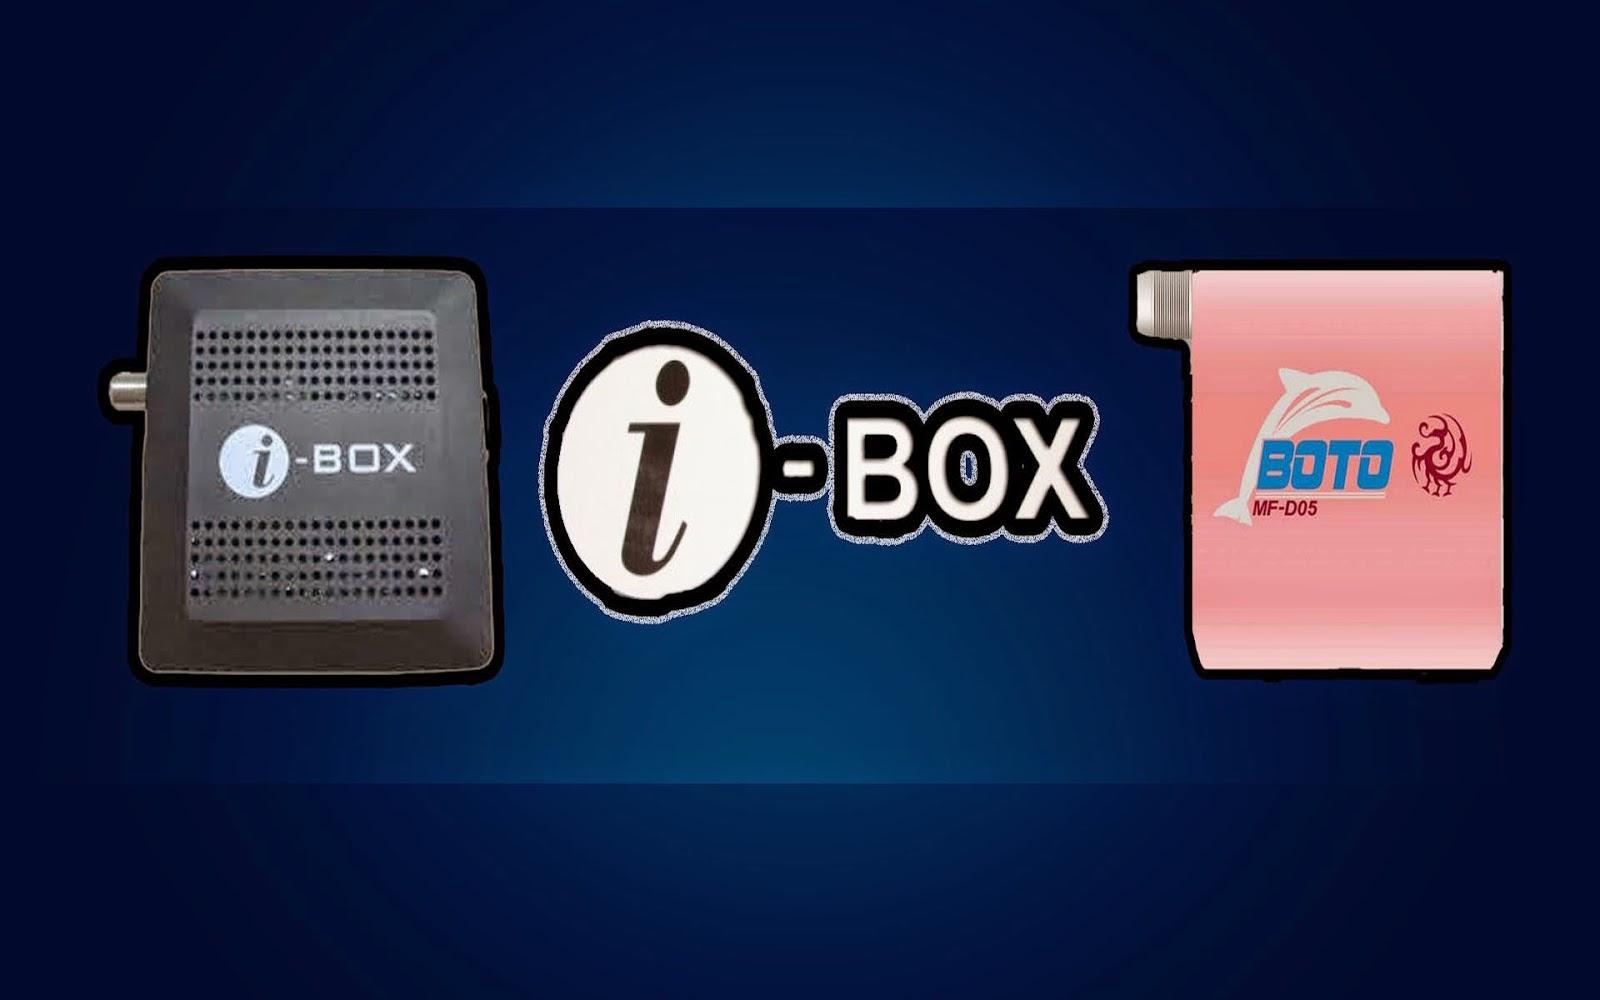 ACTUALIZACION TRANSFORMAR DONGLE IBOX A BOTO